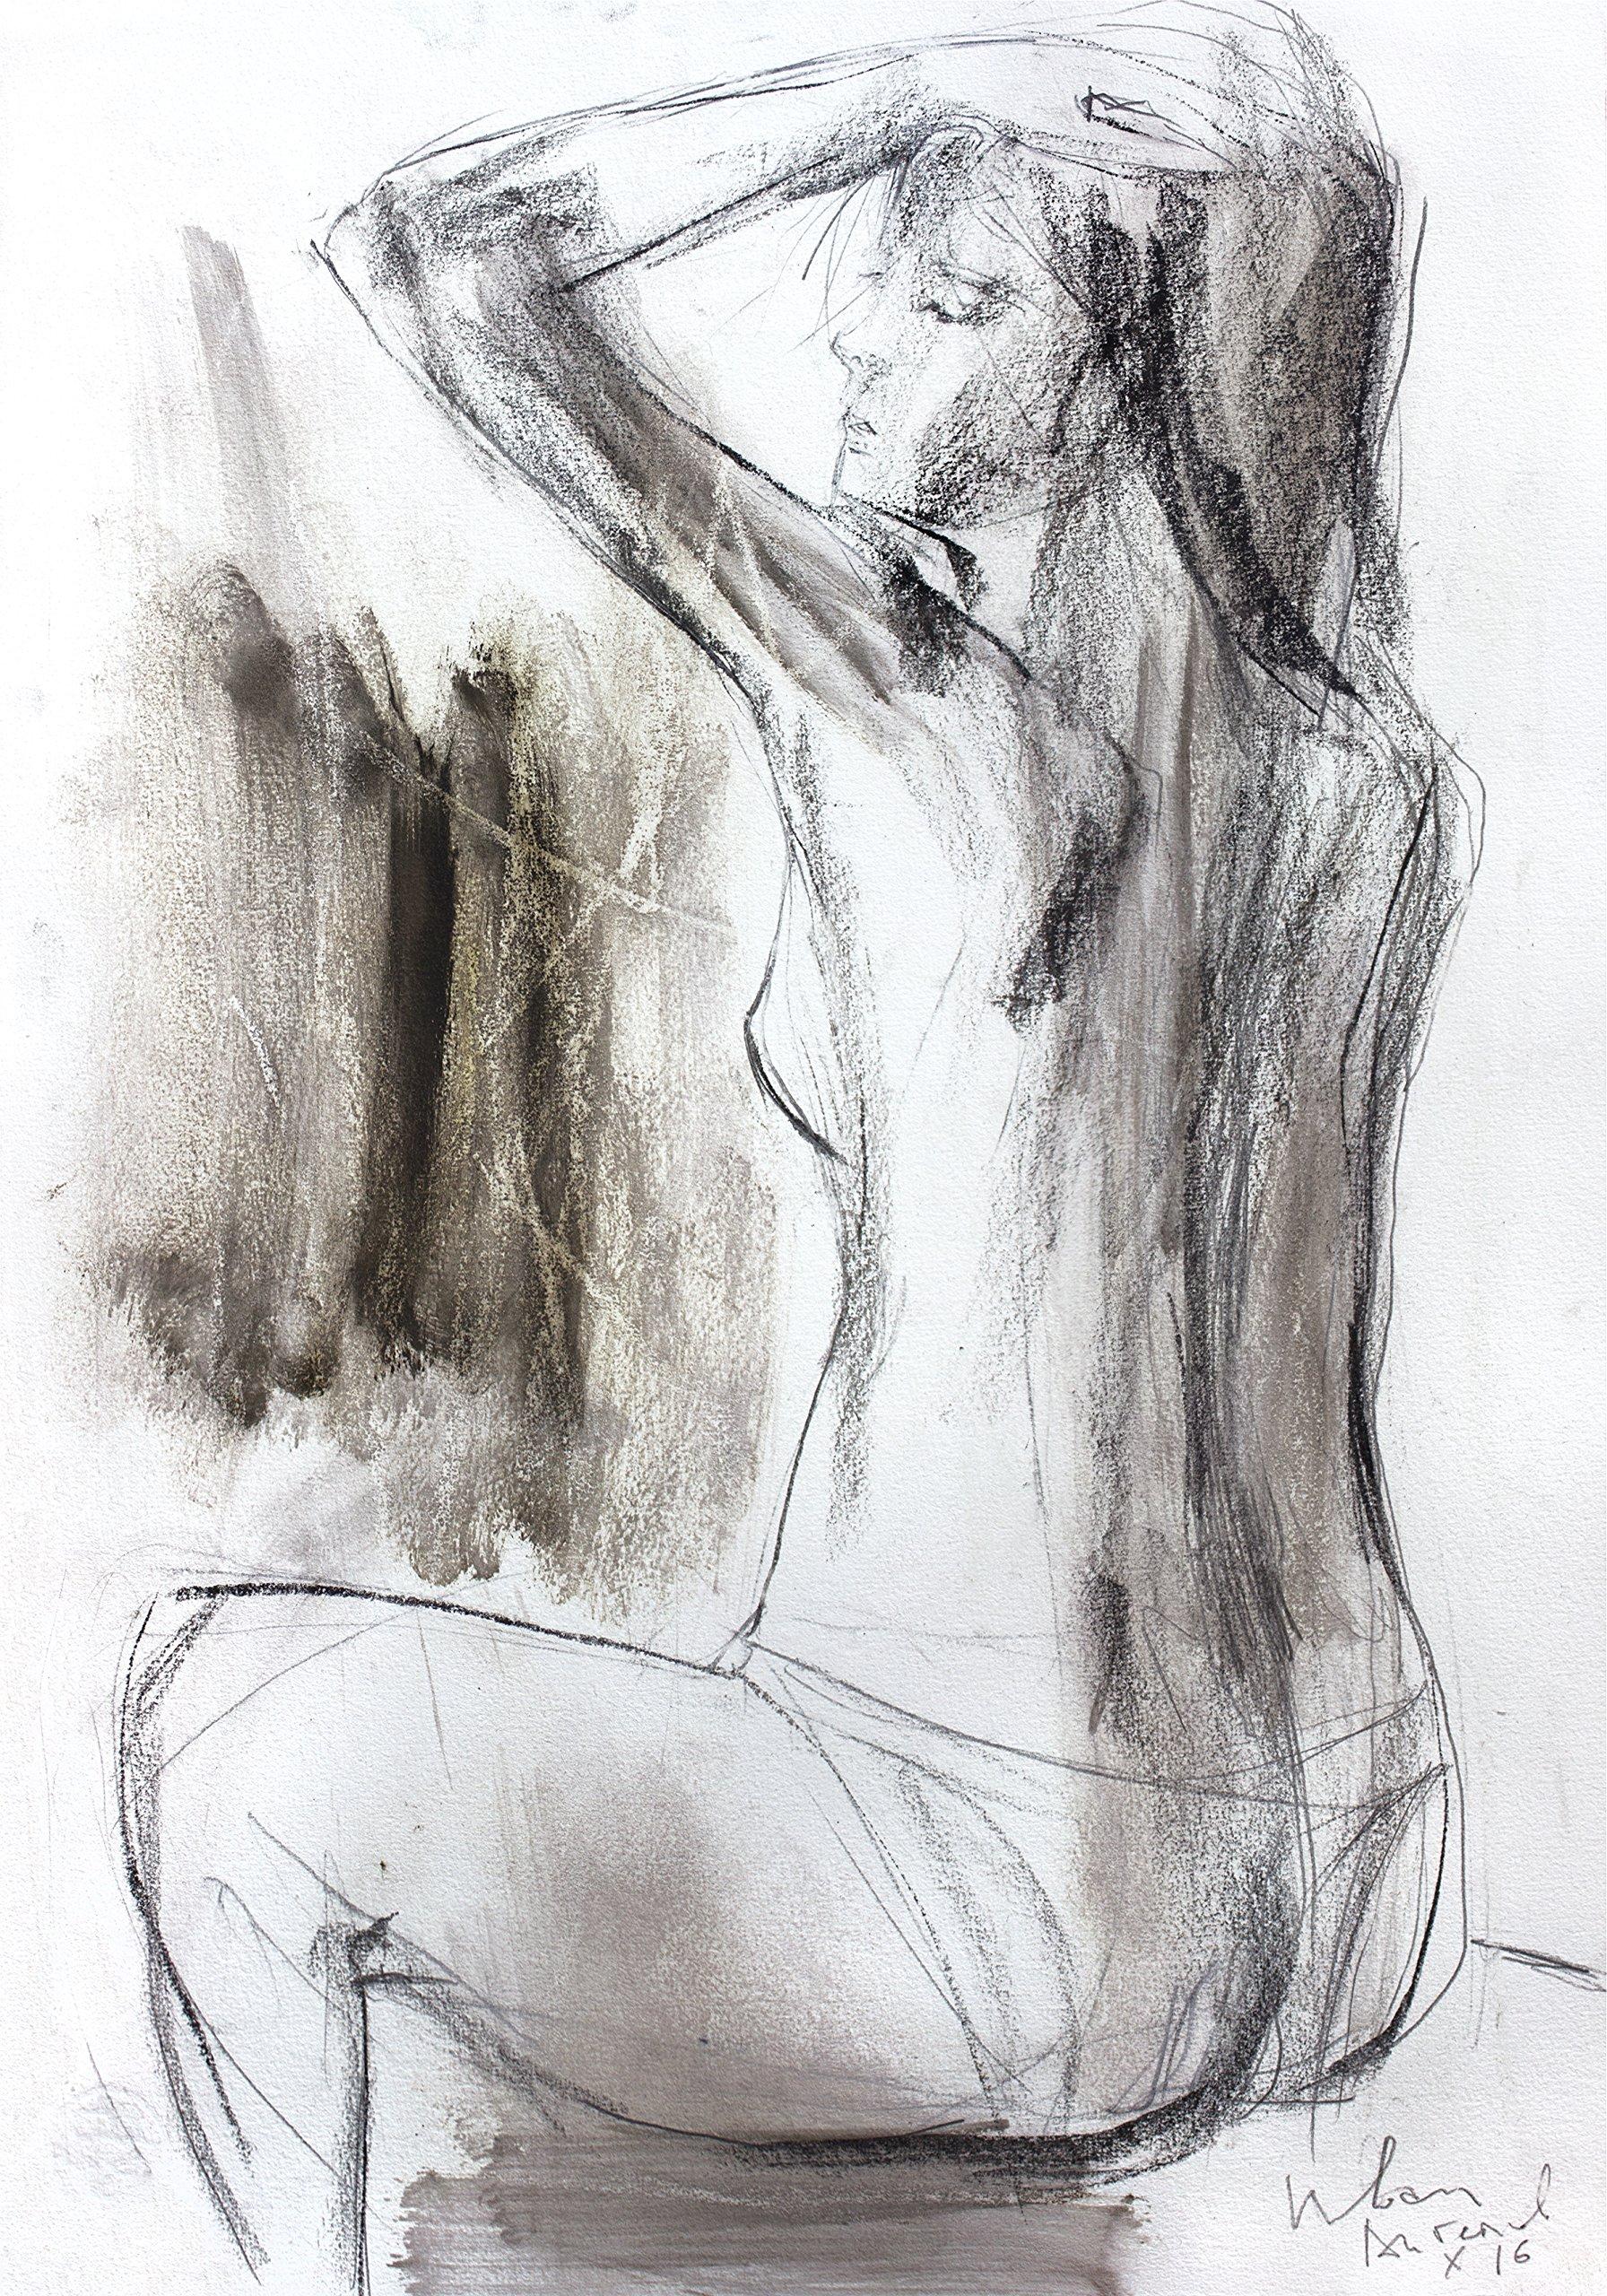 Charcoal drawing Original Artistic sketch Nude Modern Figurative graphic art Woman Wall decor